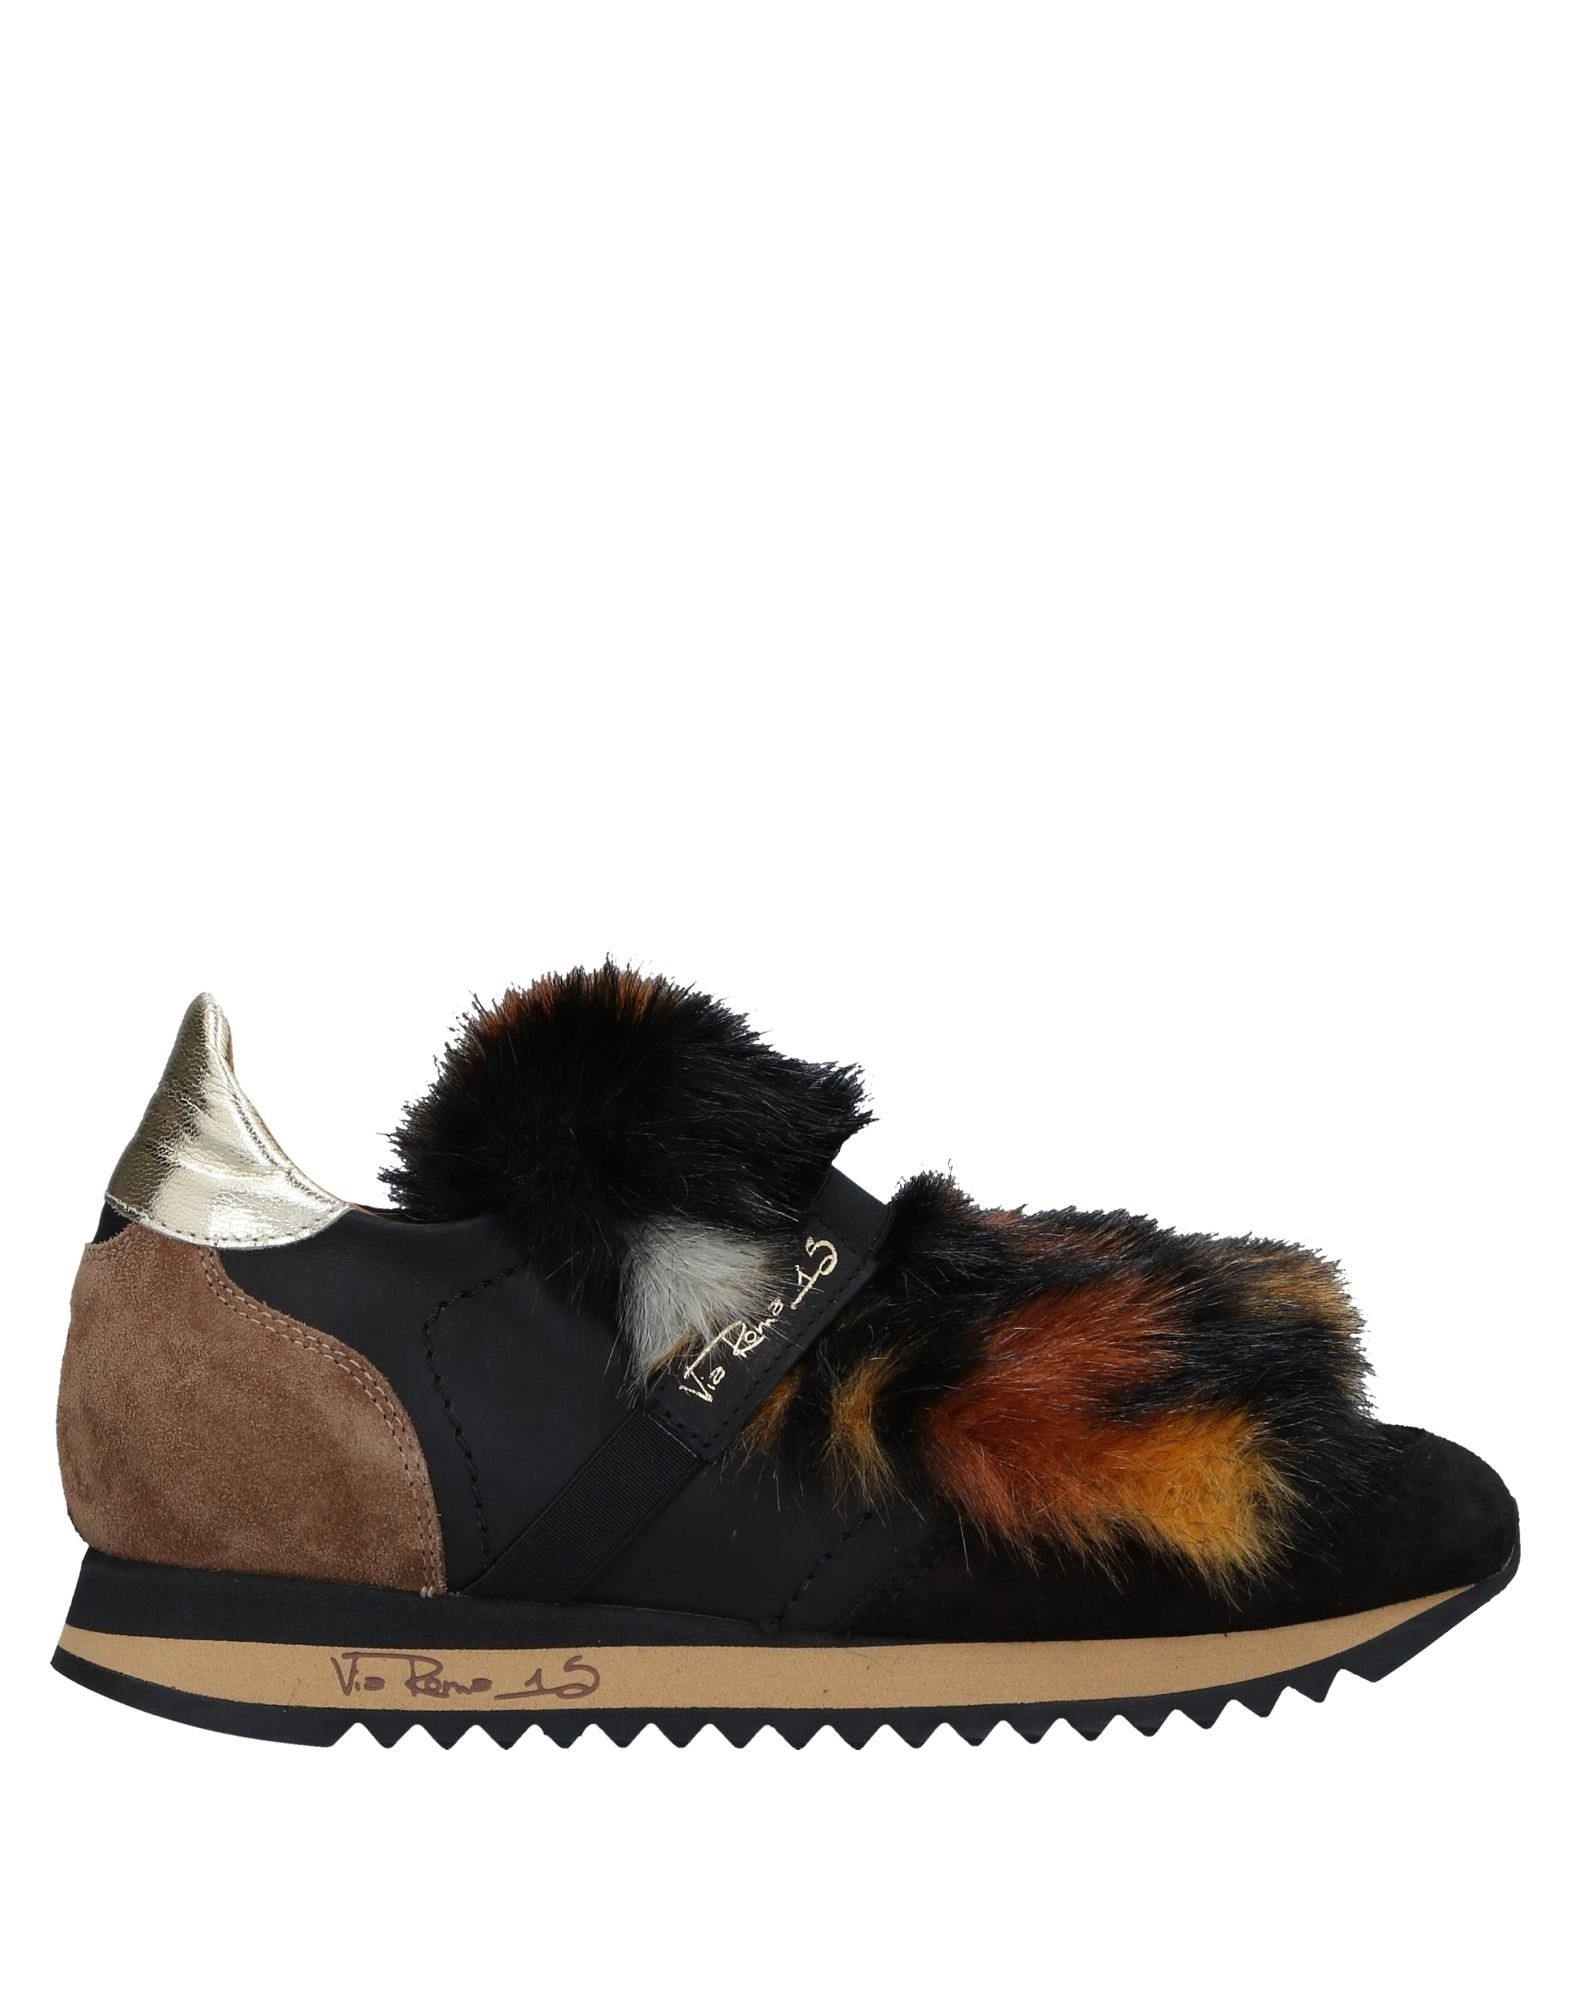 Via Roma 15 Sneakers - Women Via Roma 15 United Sneakers online on  United 15 Kingdom - 11536108HM 609b62